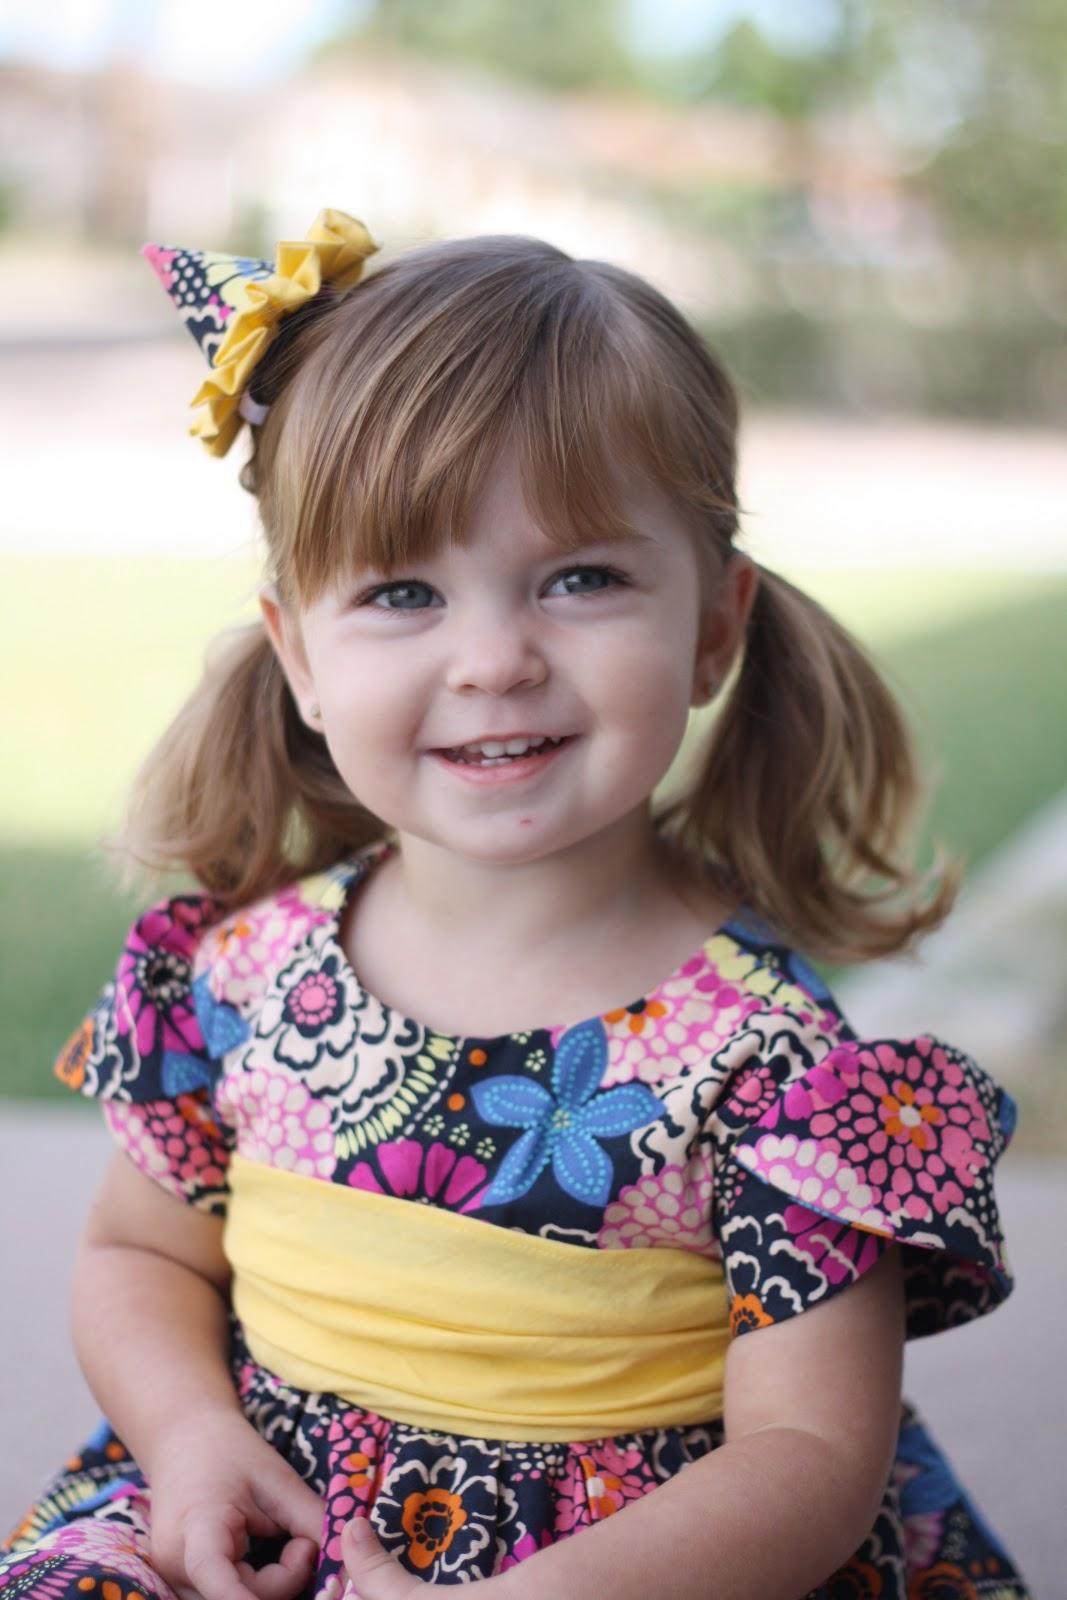 Birthday dress for baby girl for first birthday